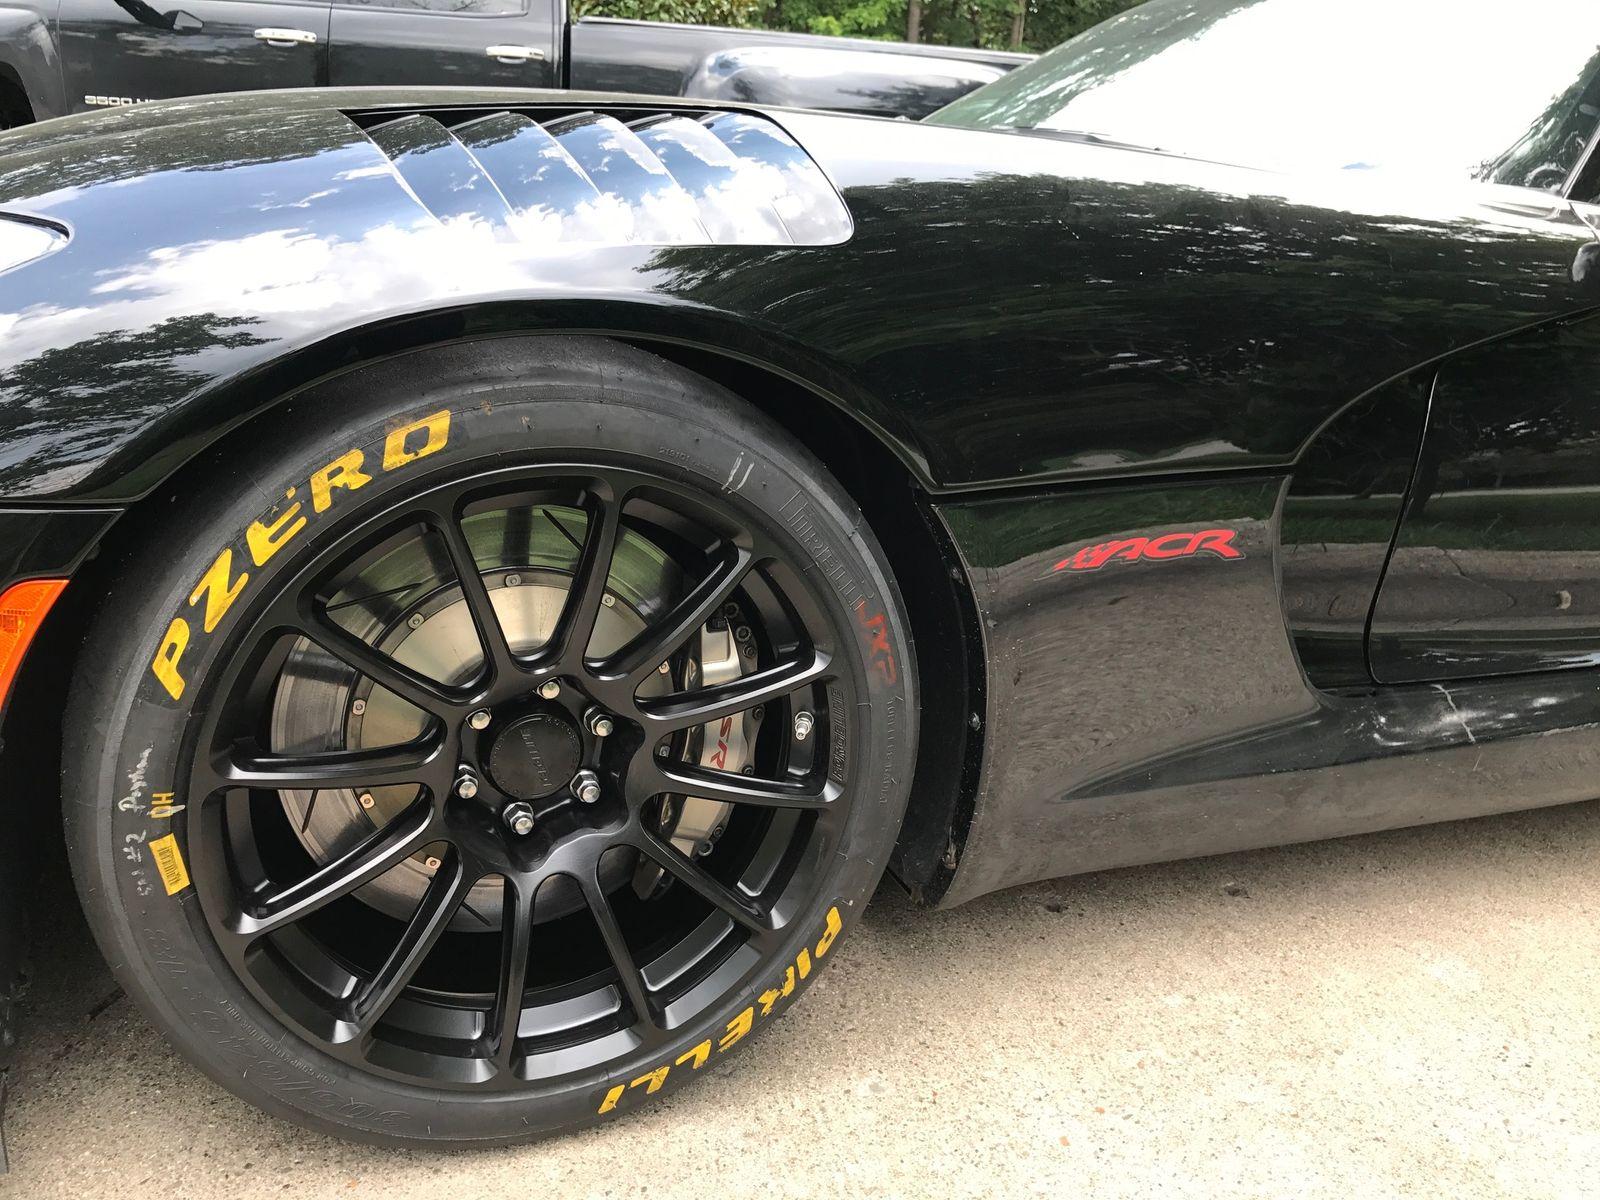 2016 Dodge Viper | Luke Mcgrew's Dodge Viper ACR Extreme on Forgeline One Piece Forged Monoblock GTD1-Viper Wheels